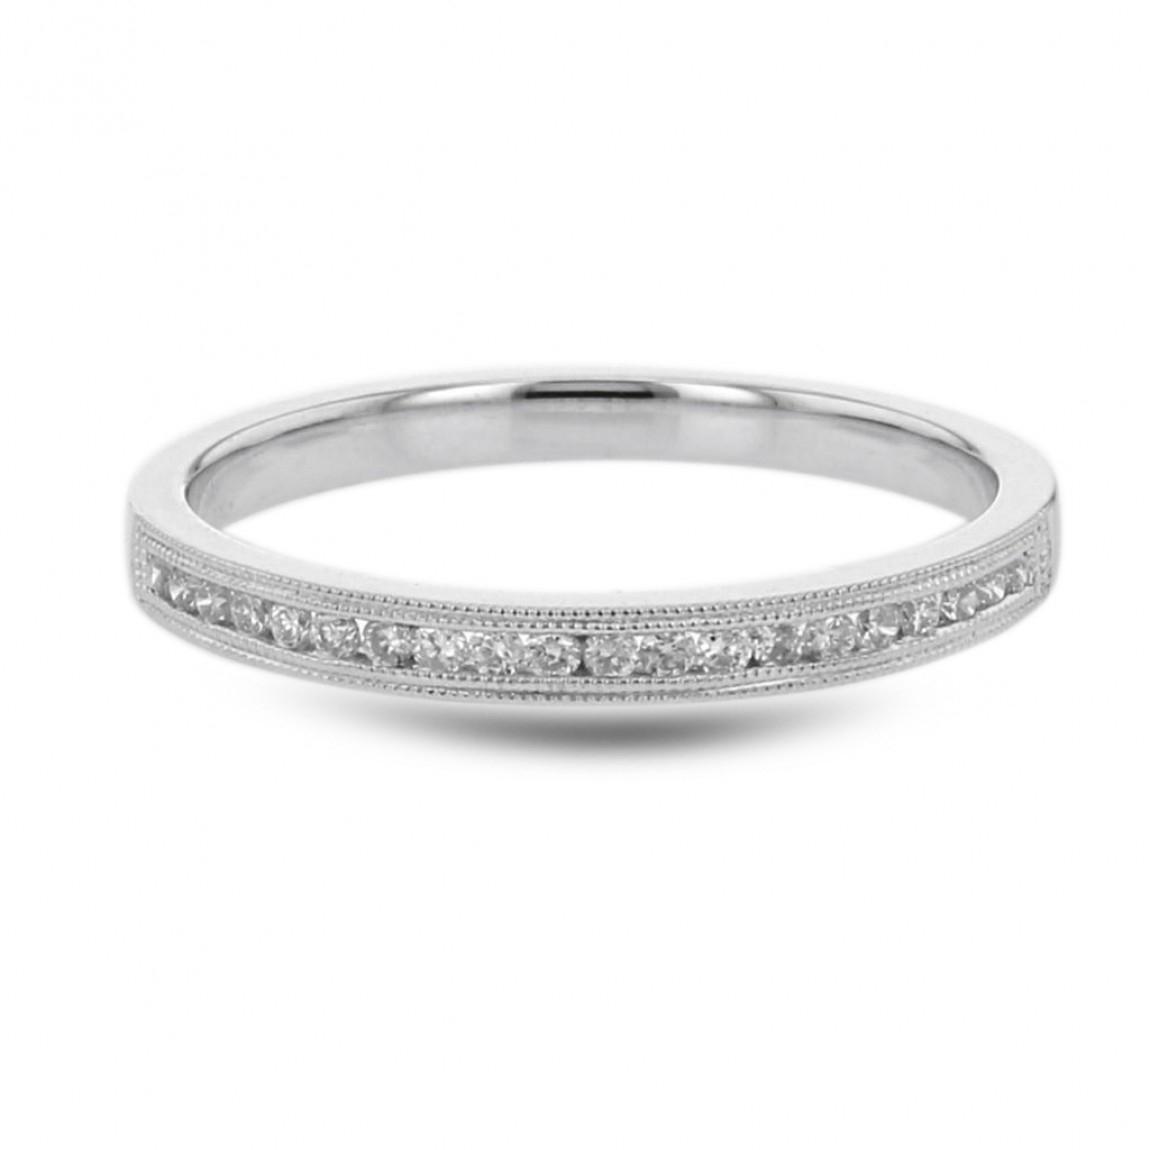 Diamond Wedding Anniversary Band, Milgrain Channel Ring, 14k White Gold, (View 3 of 25)